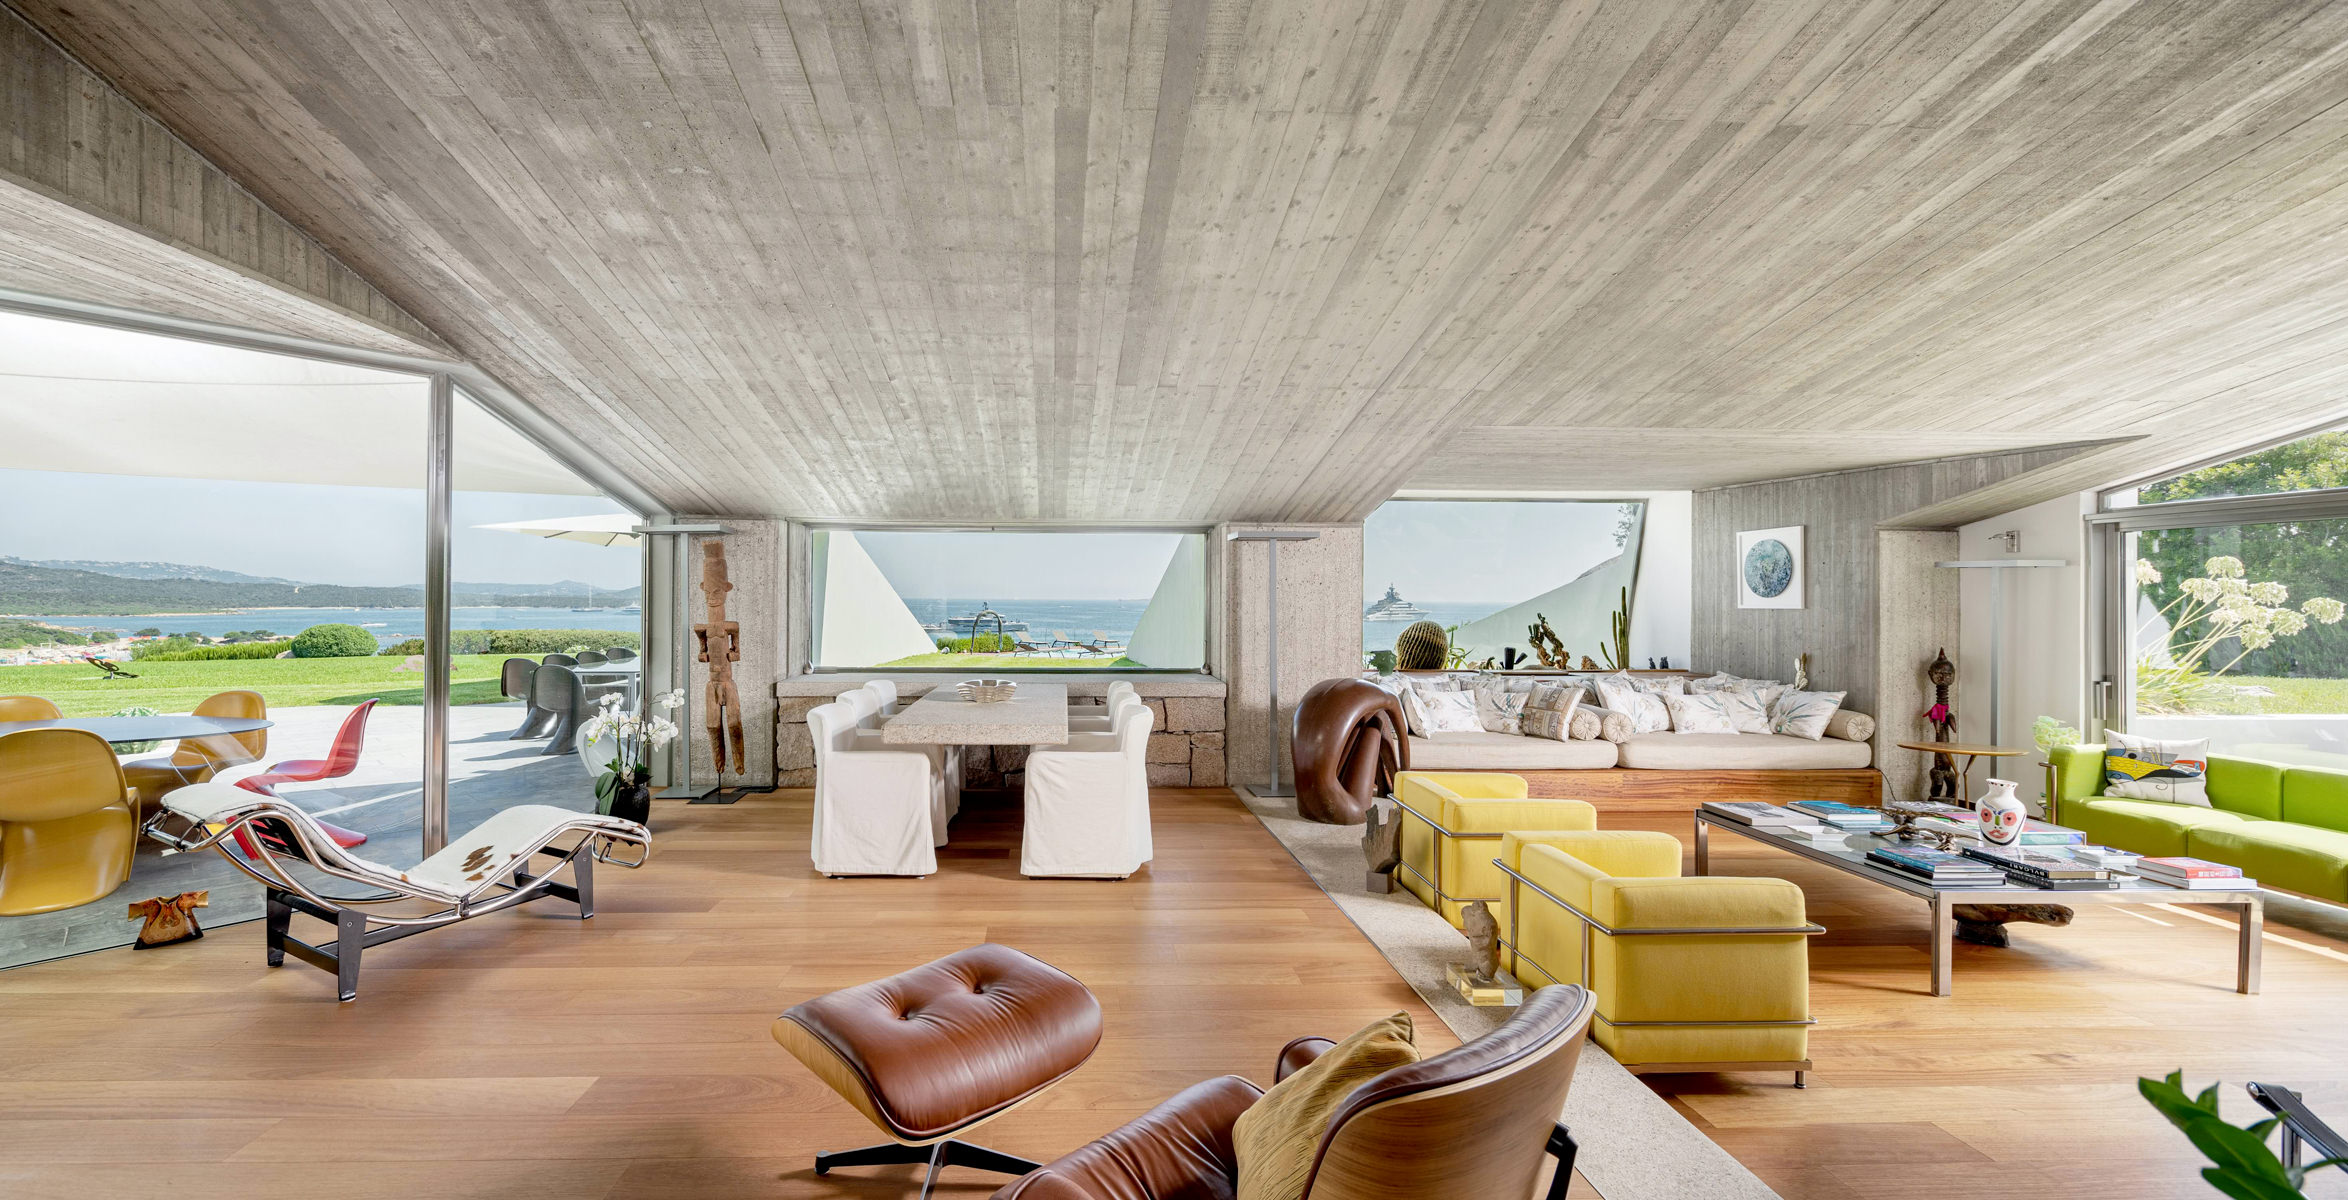 View of the living room of the Bulgari villa in Porto Cervo